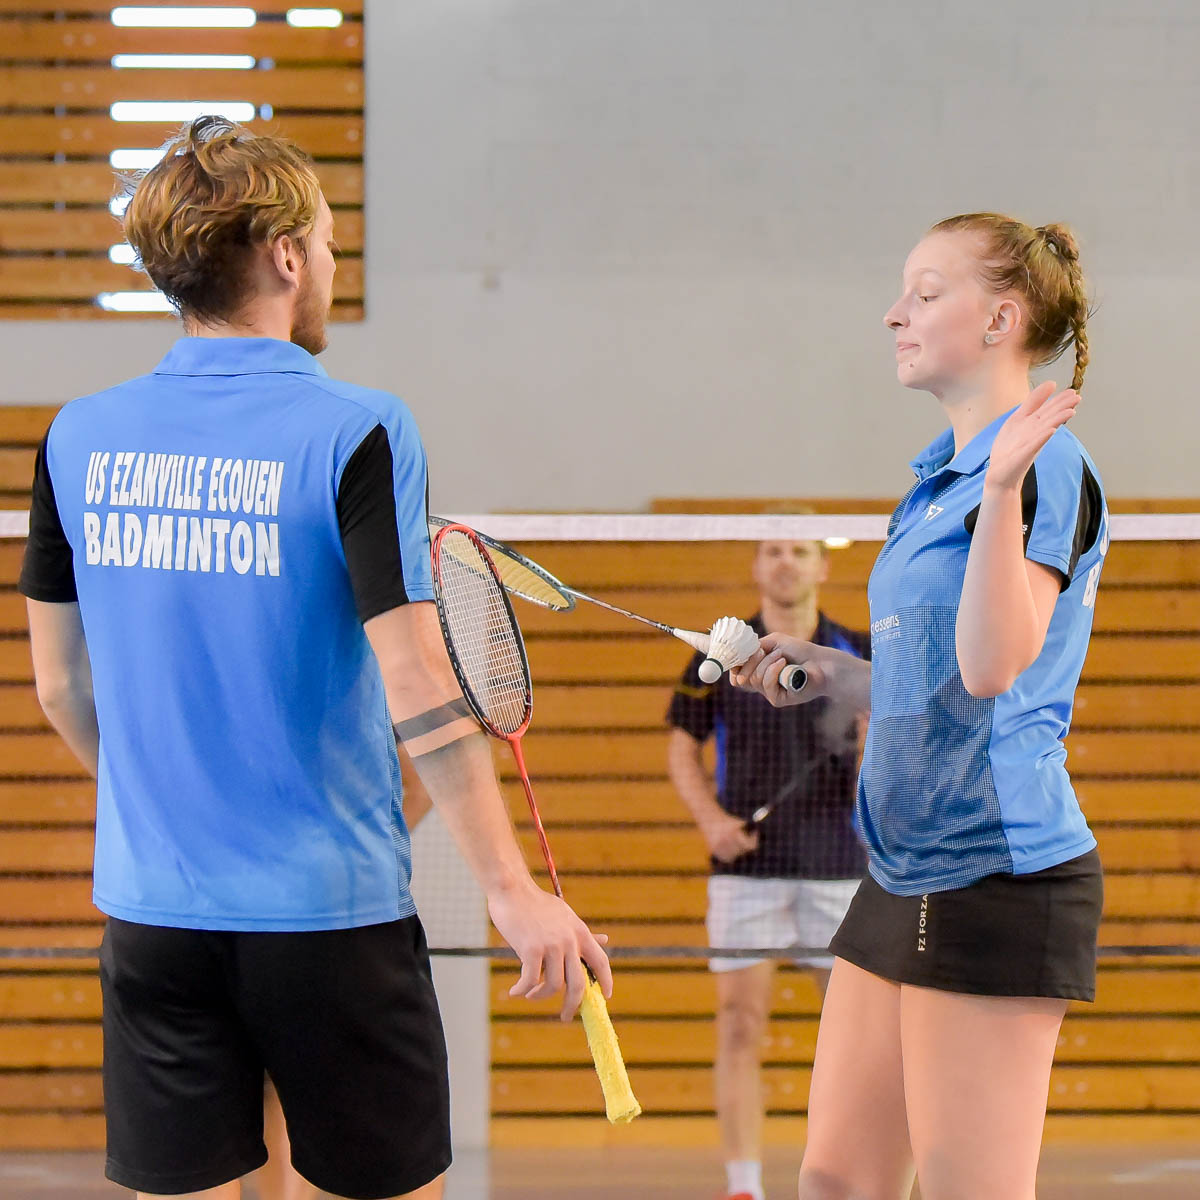 Delphine Delrue Interclub N1 USEE Badminton Equipe1 Saison 2017 18 1200